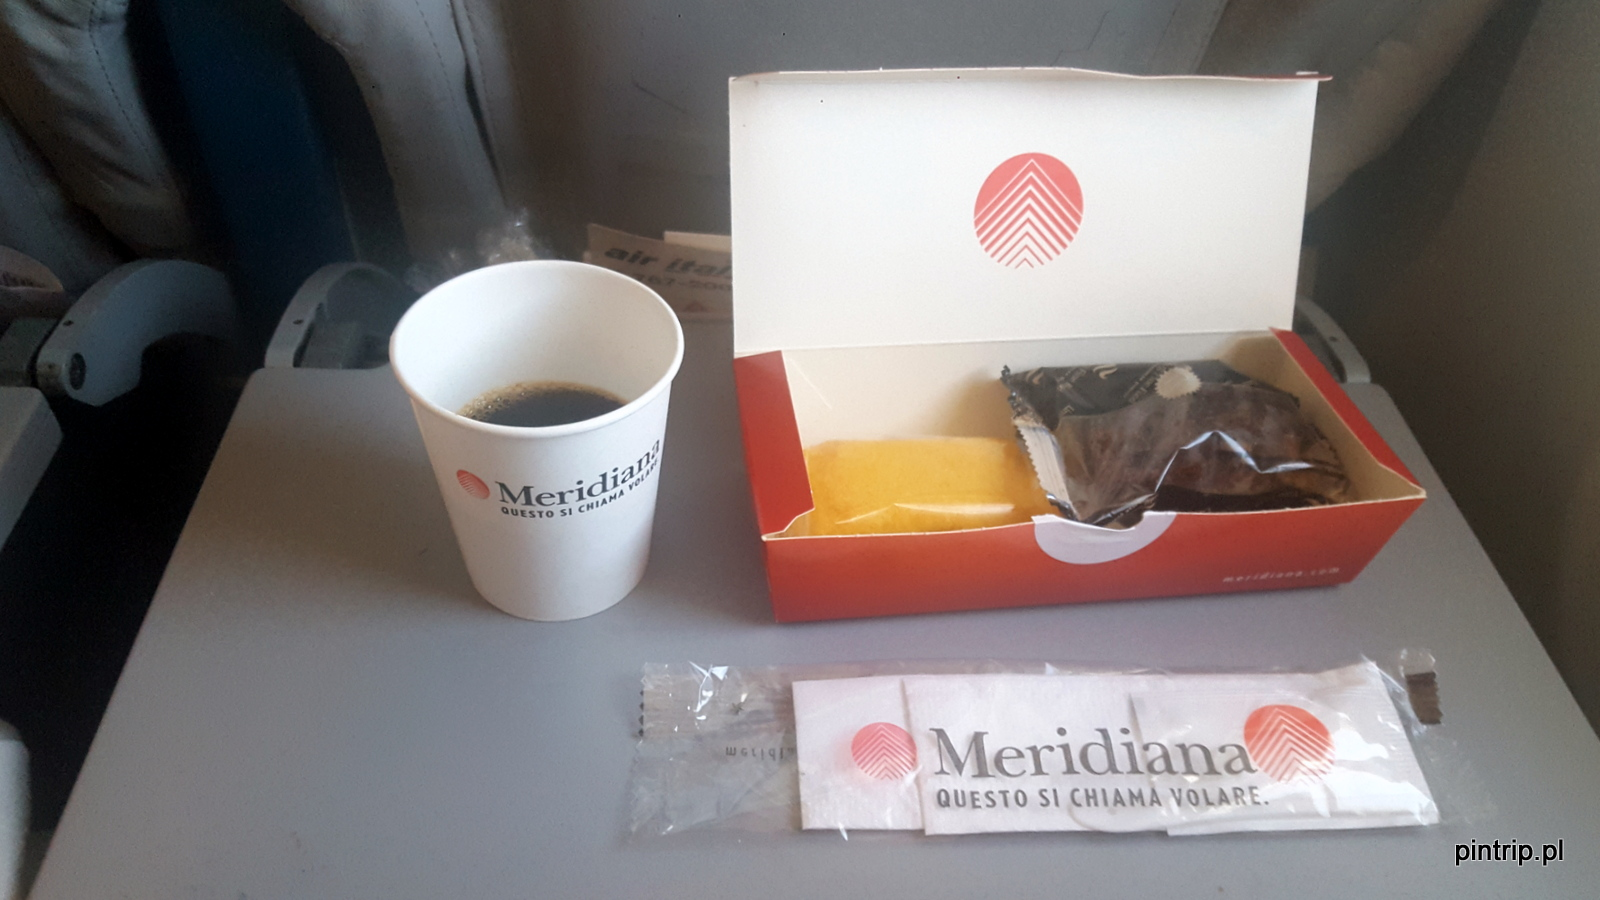 meridiana snack